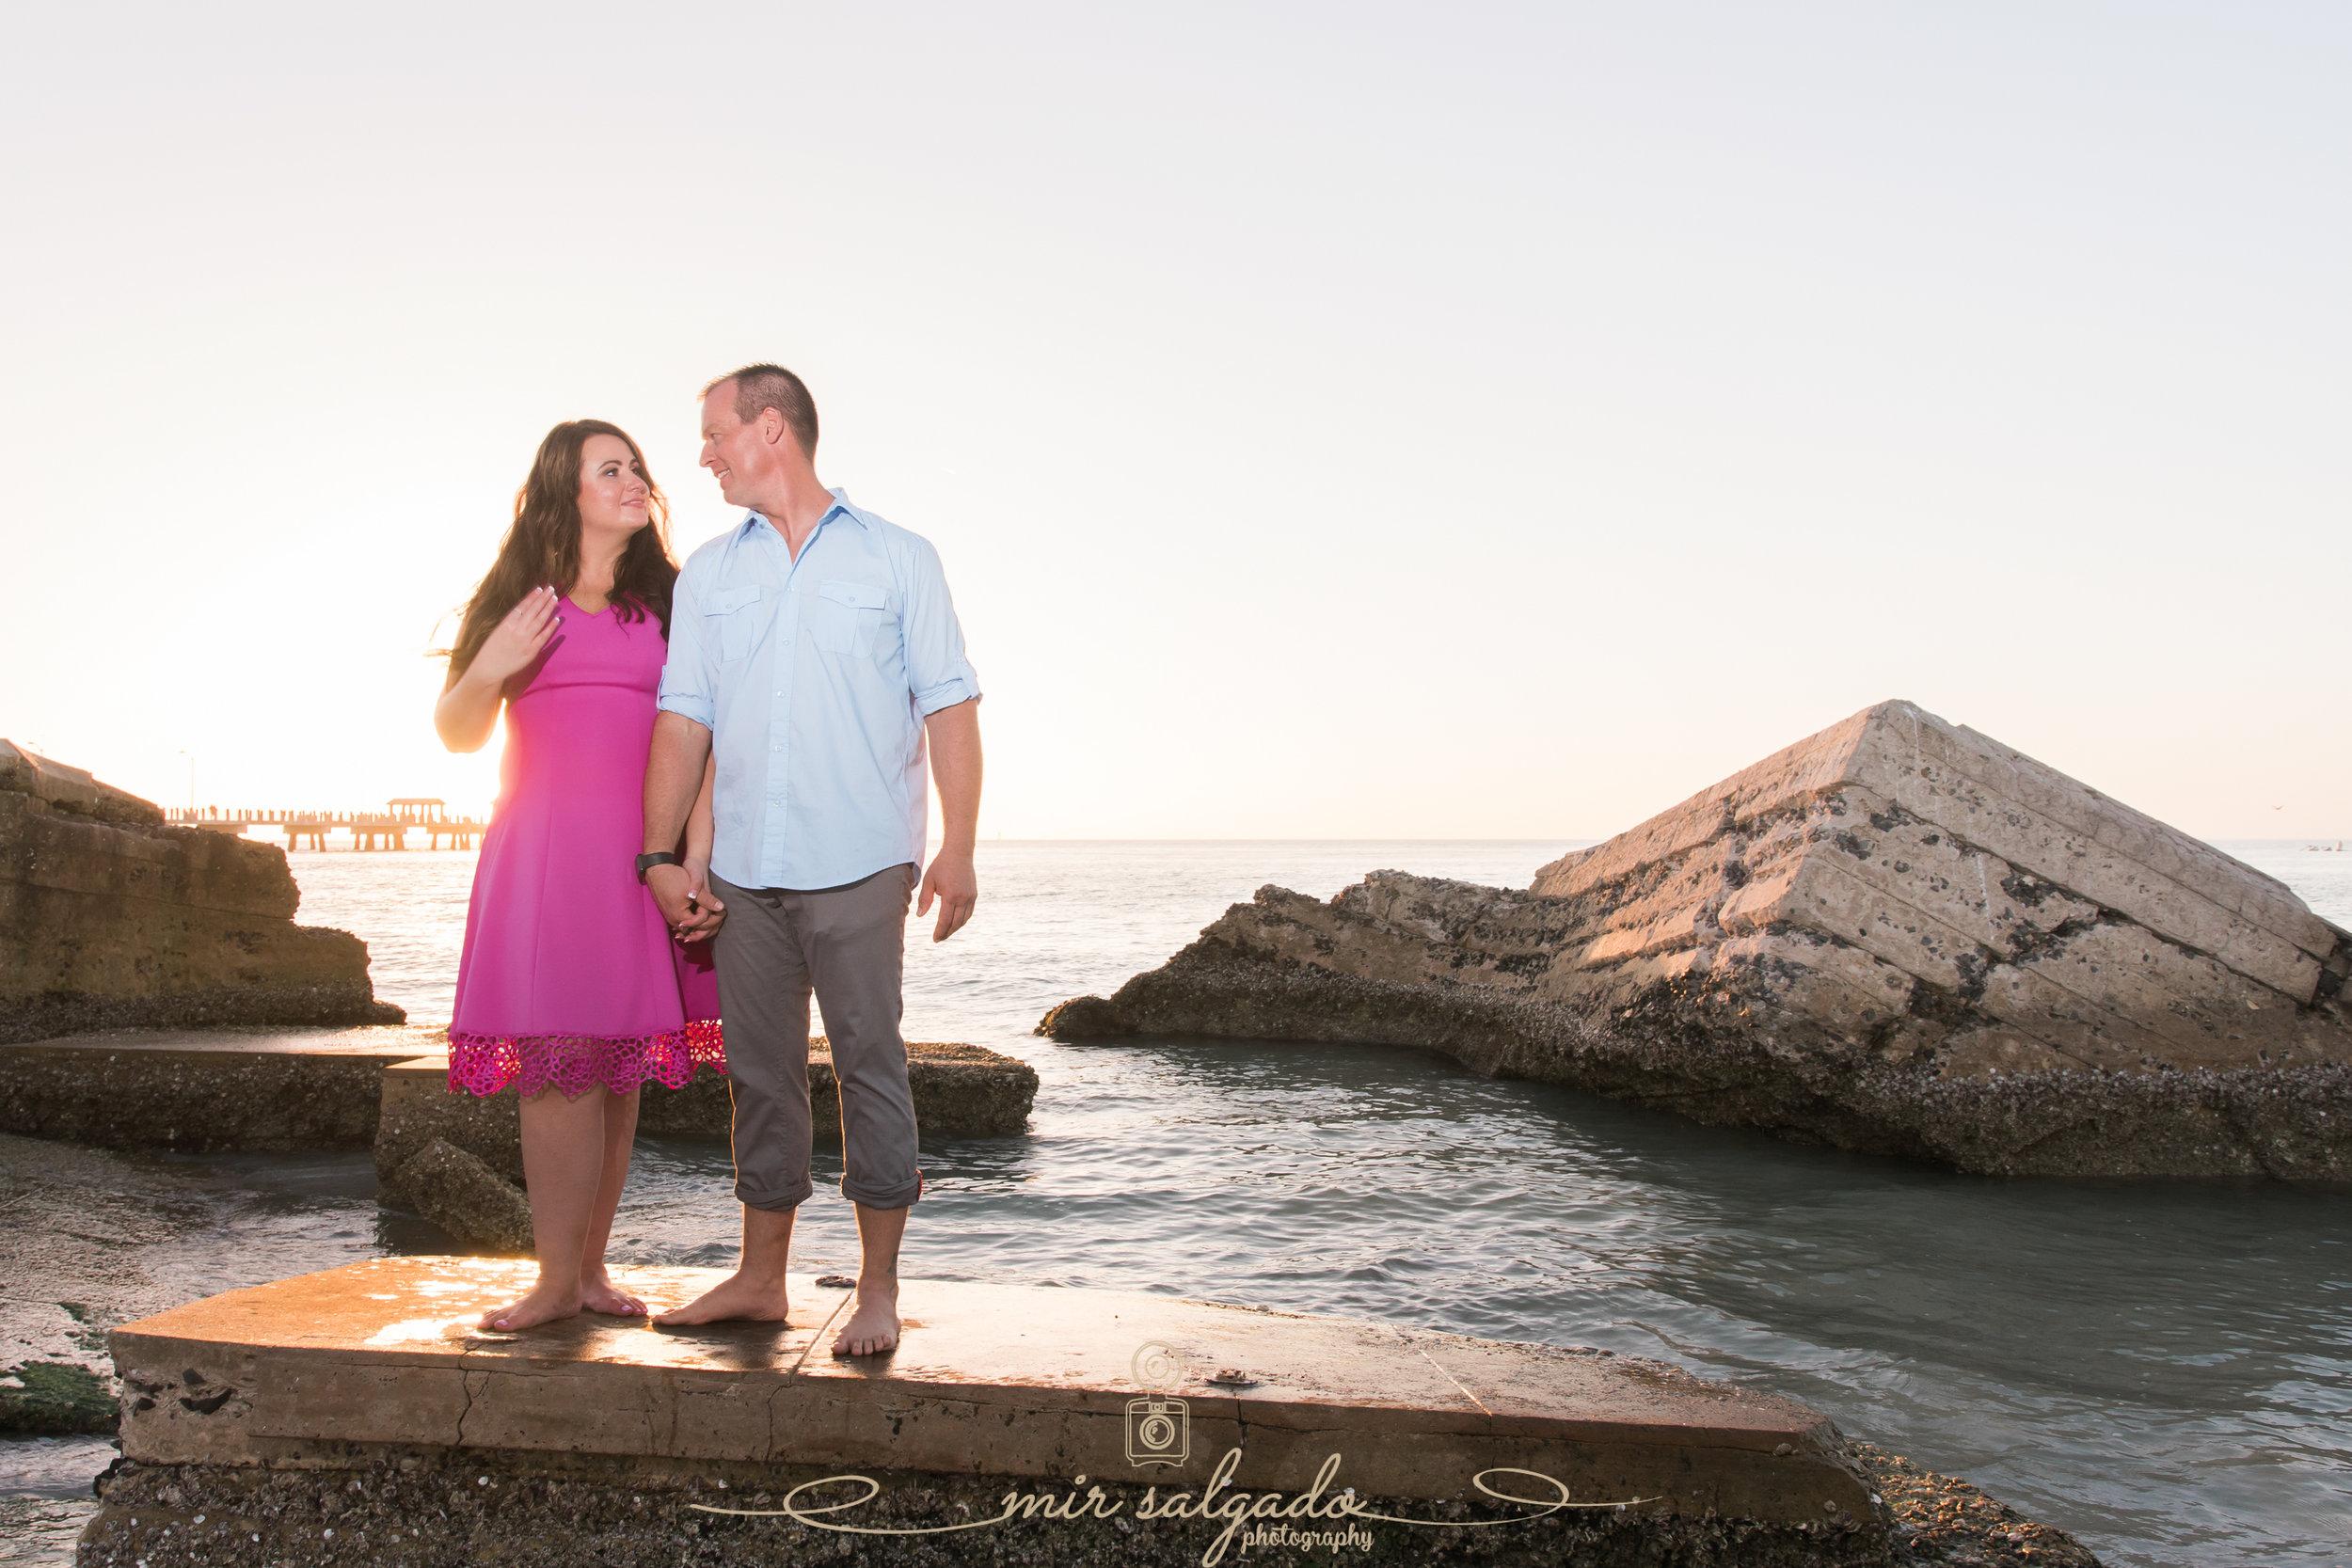 Fort-de-Soto-engagement-session, Florida-wedding-photographer